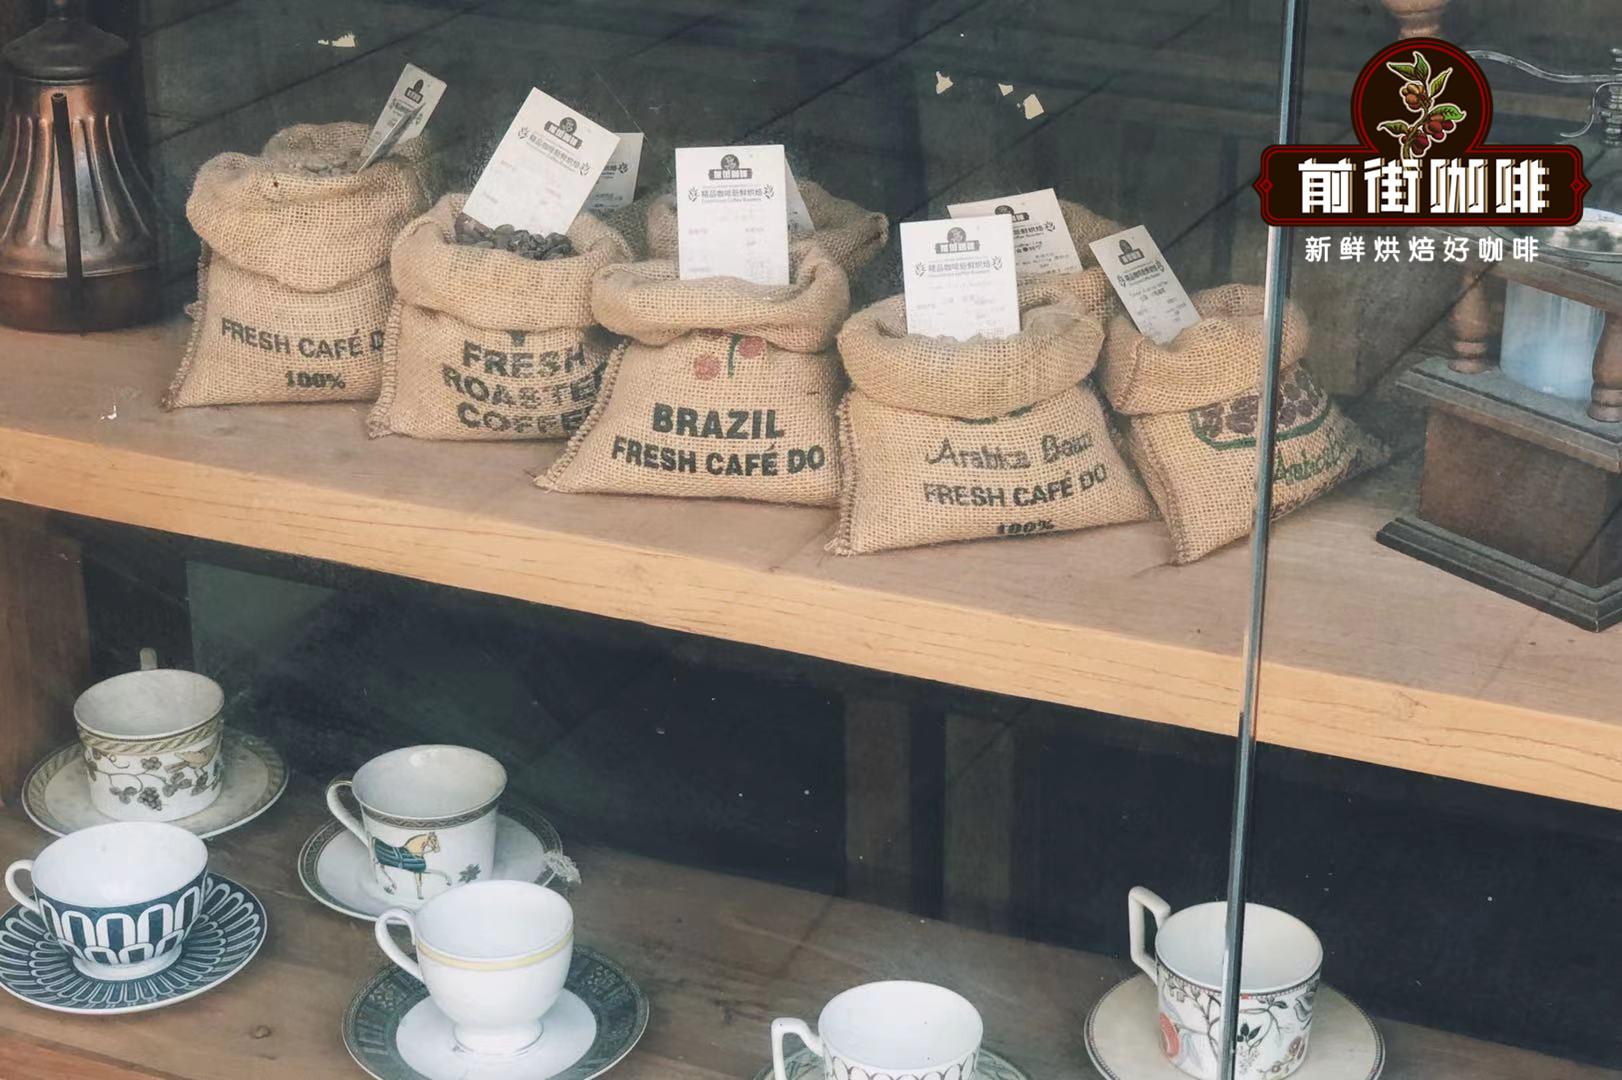 chemex介绍 chemex咖啡壶优缺点 咖啡器具chemex咖啡壶特点